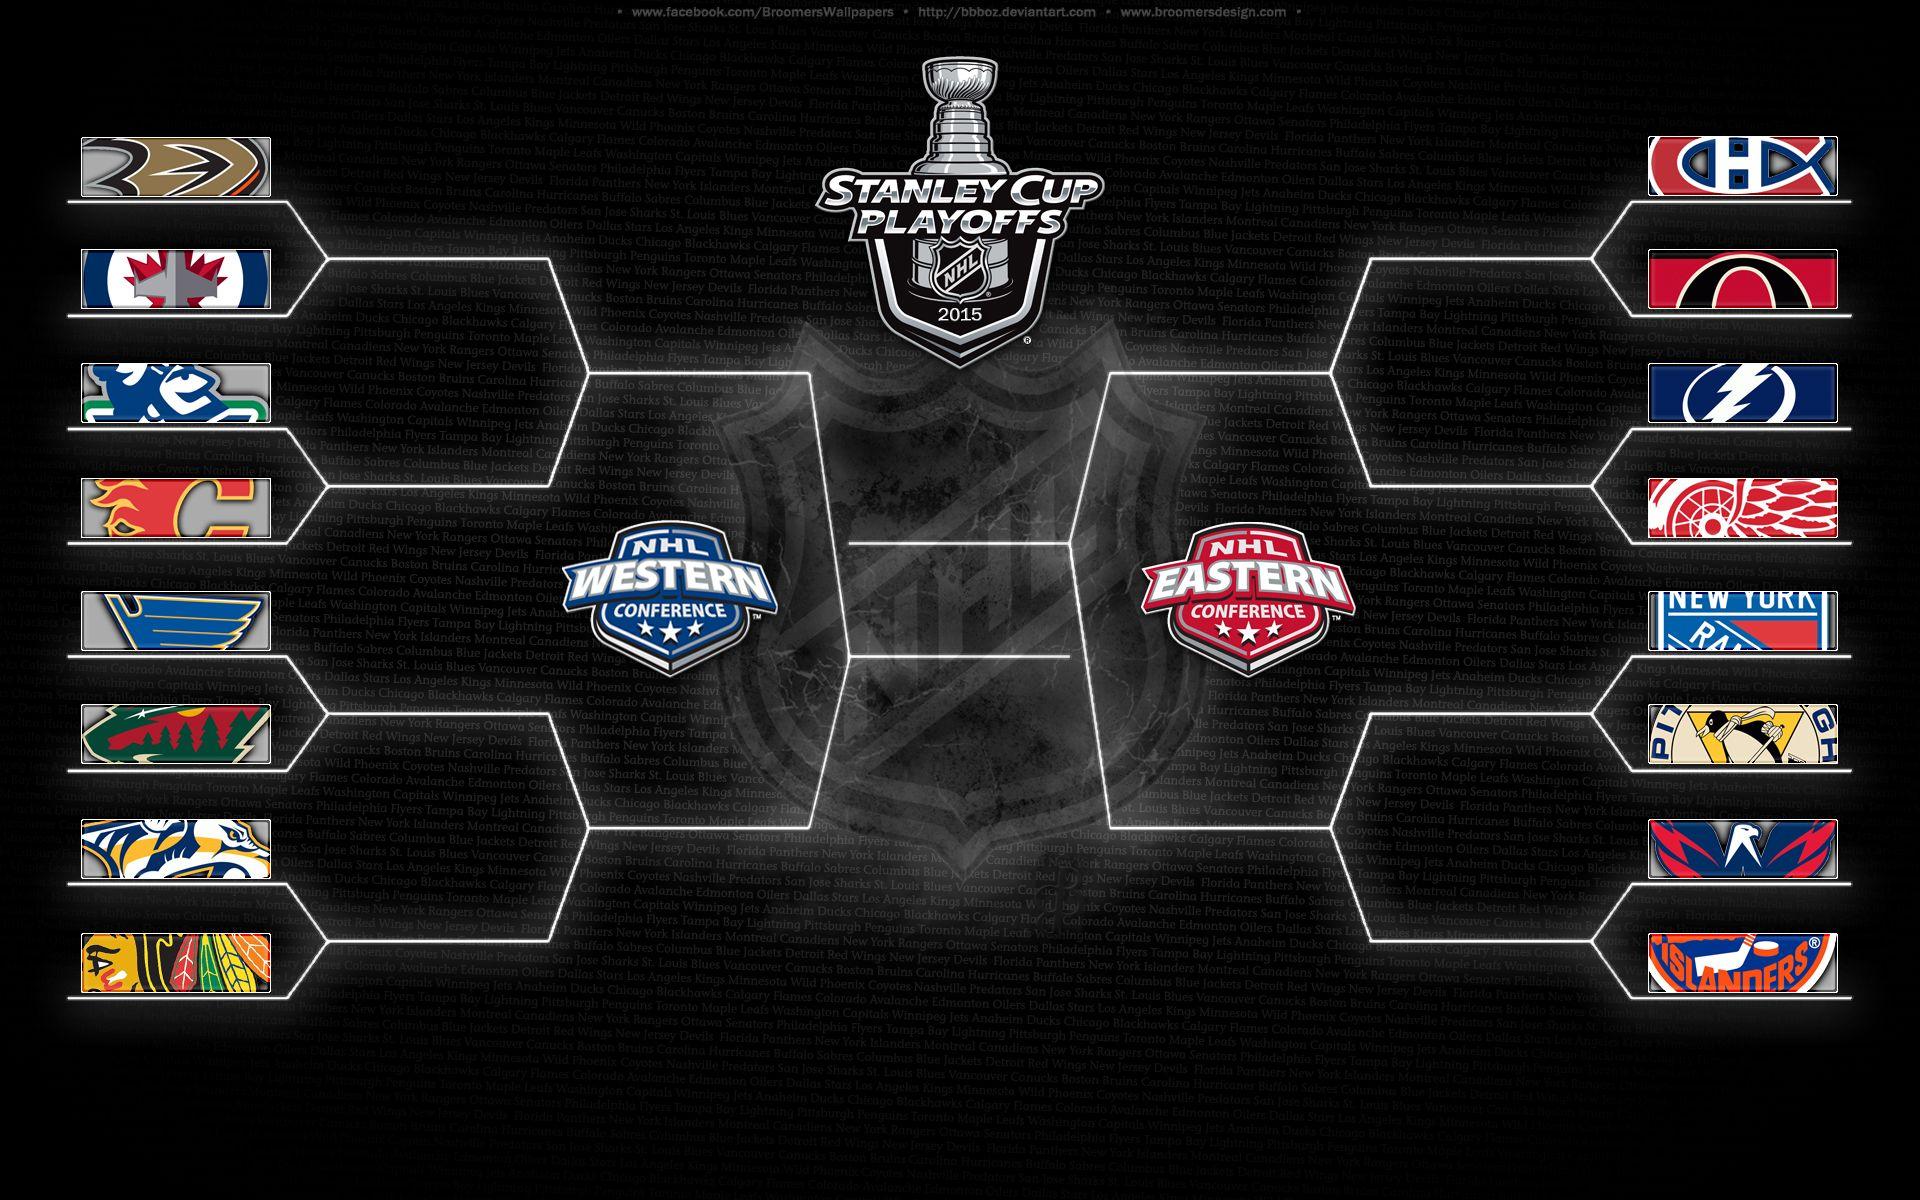 2015 Nhl Playoff Bracket Nhl Playoffs Nhl Playoffs